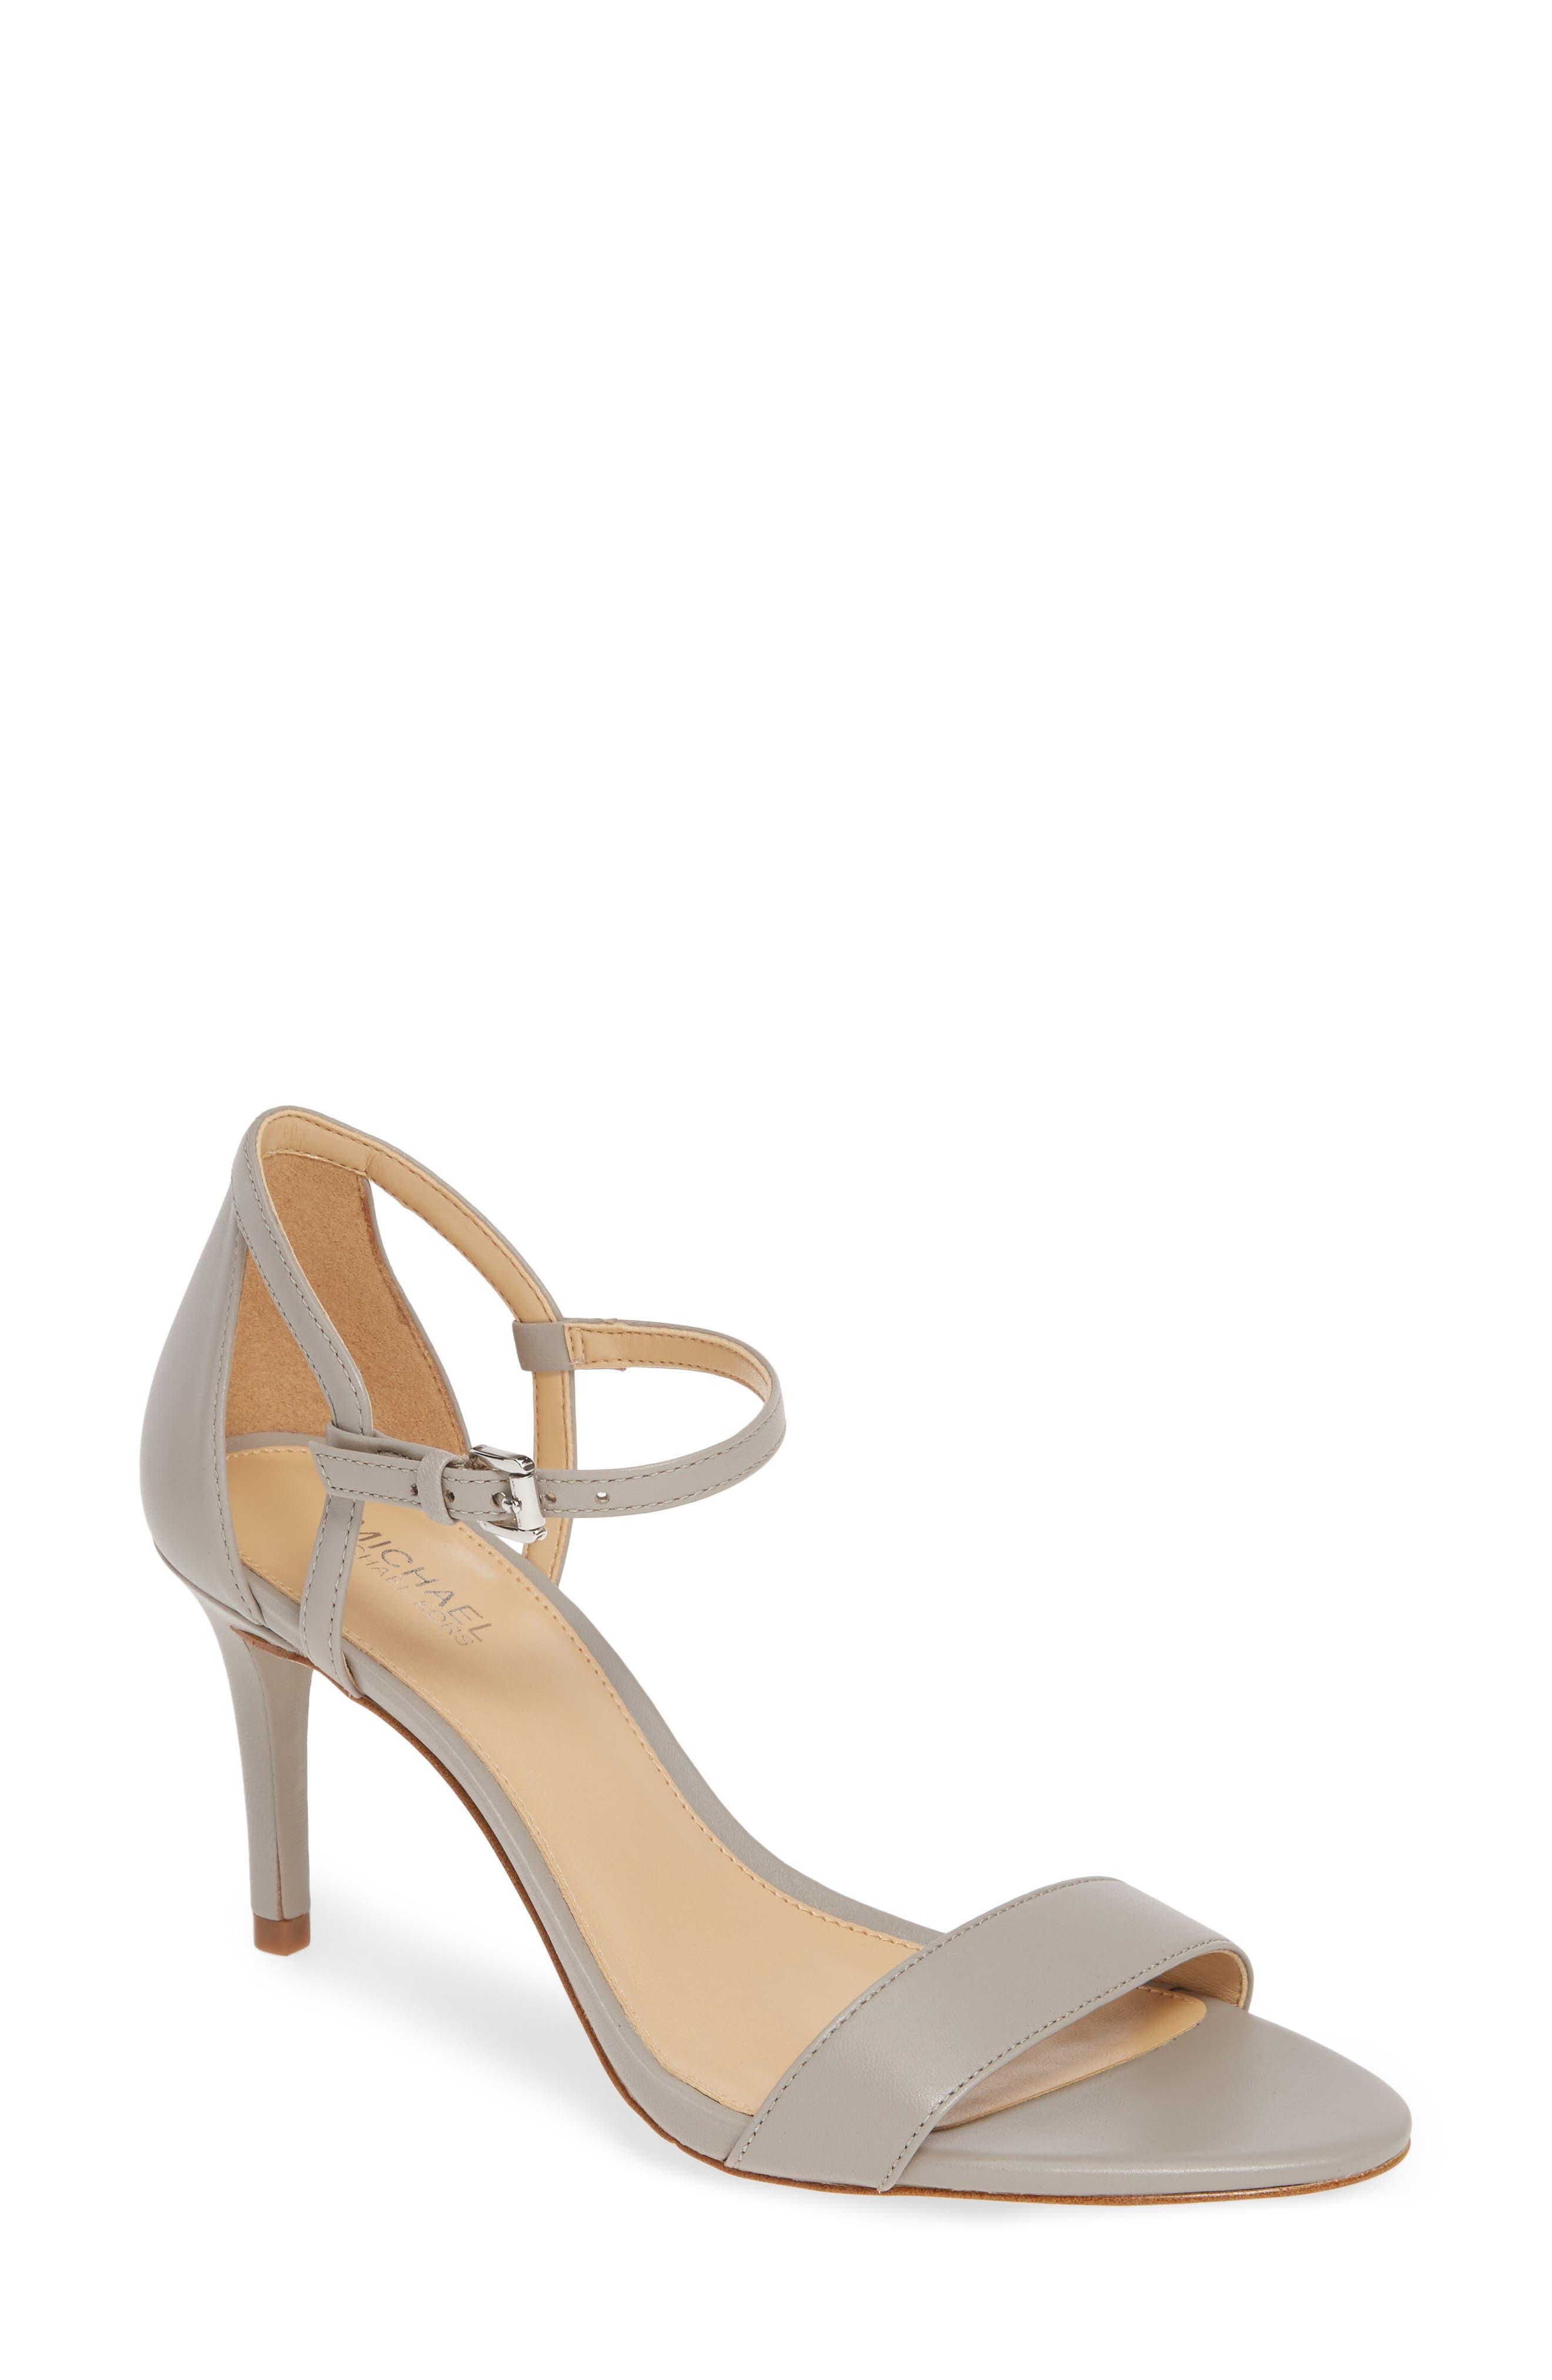 03b4ca2581085 Women's Wedding Shoes | Nordstrom